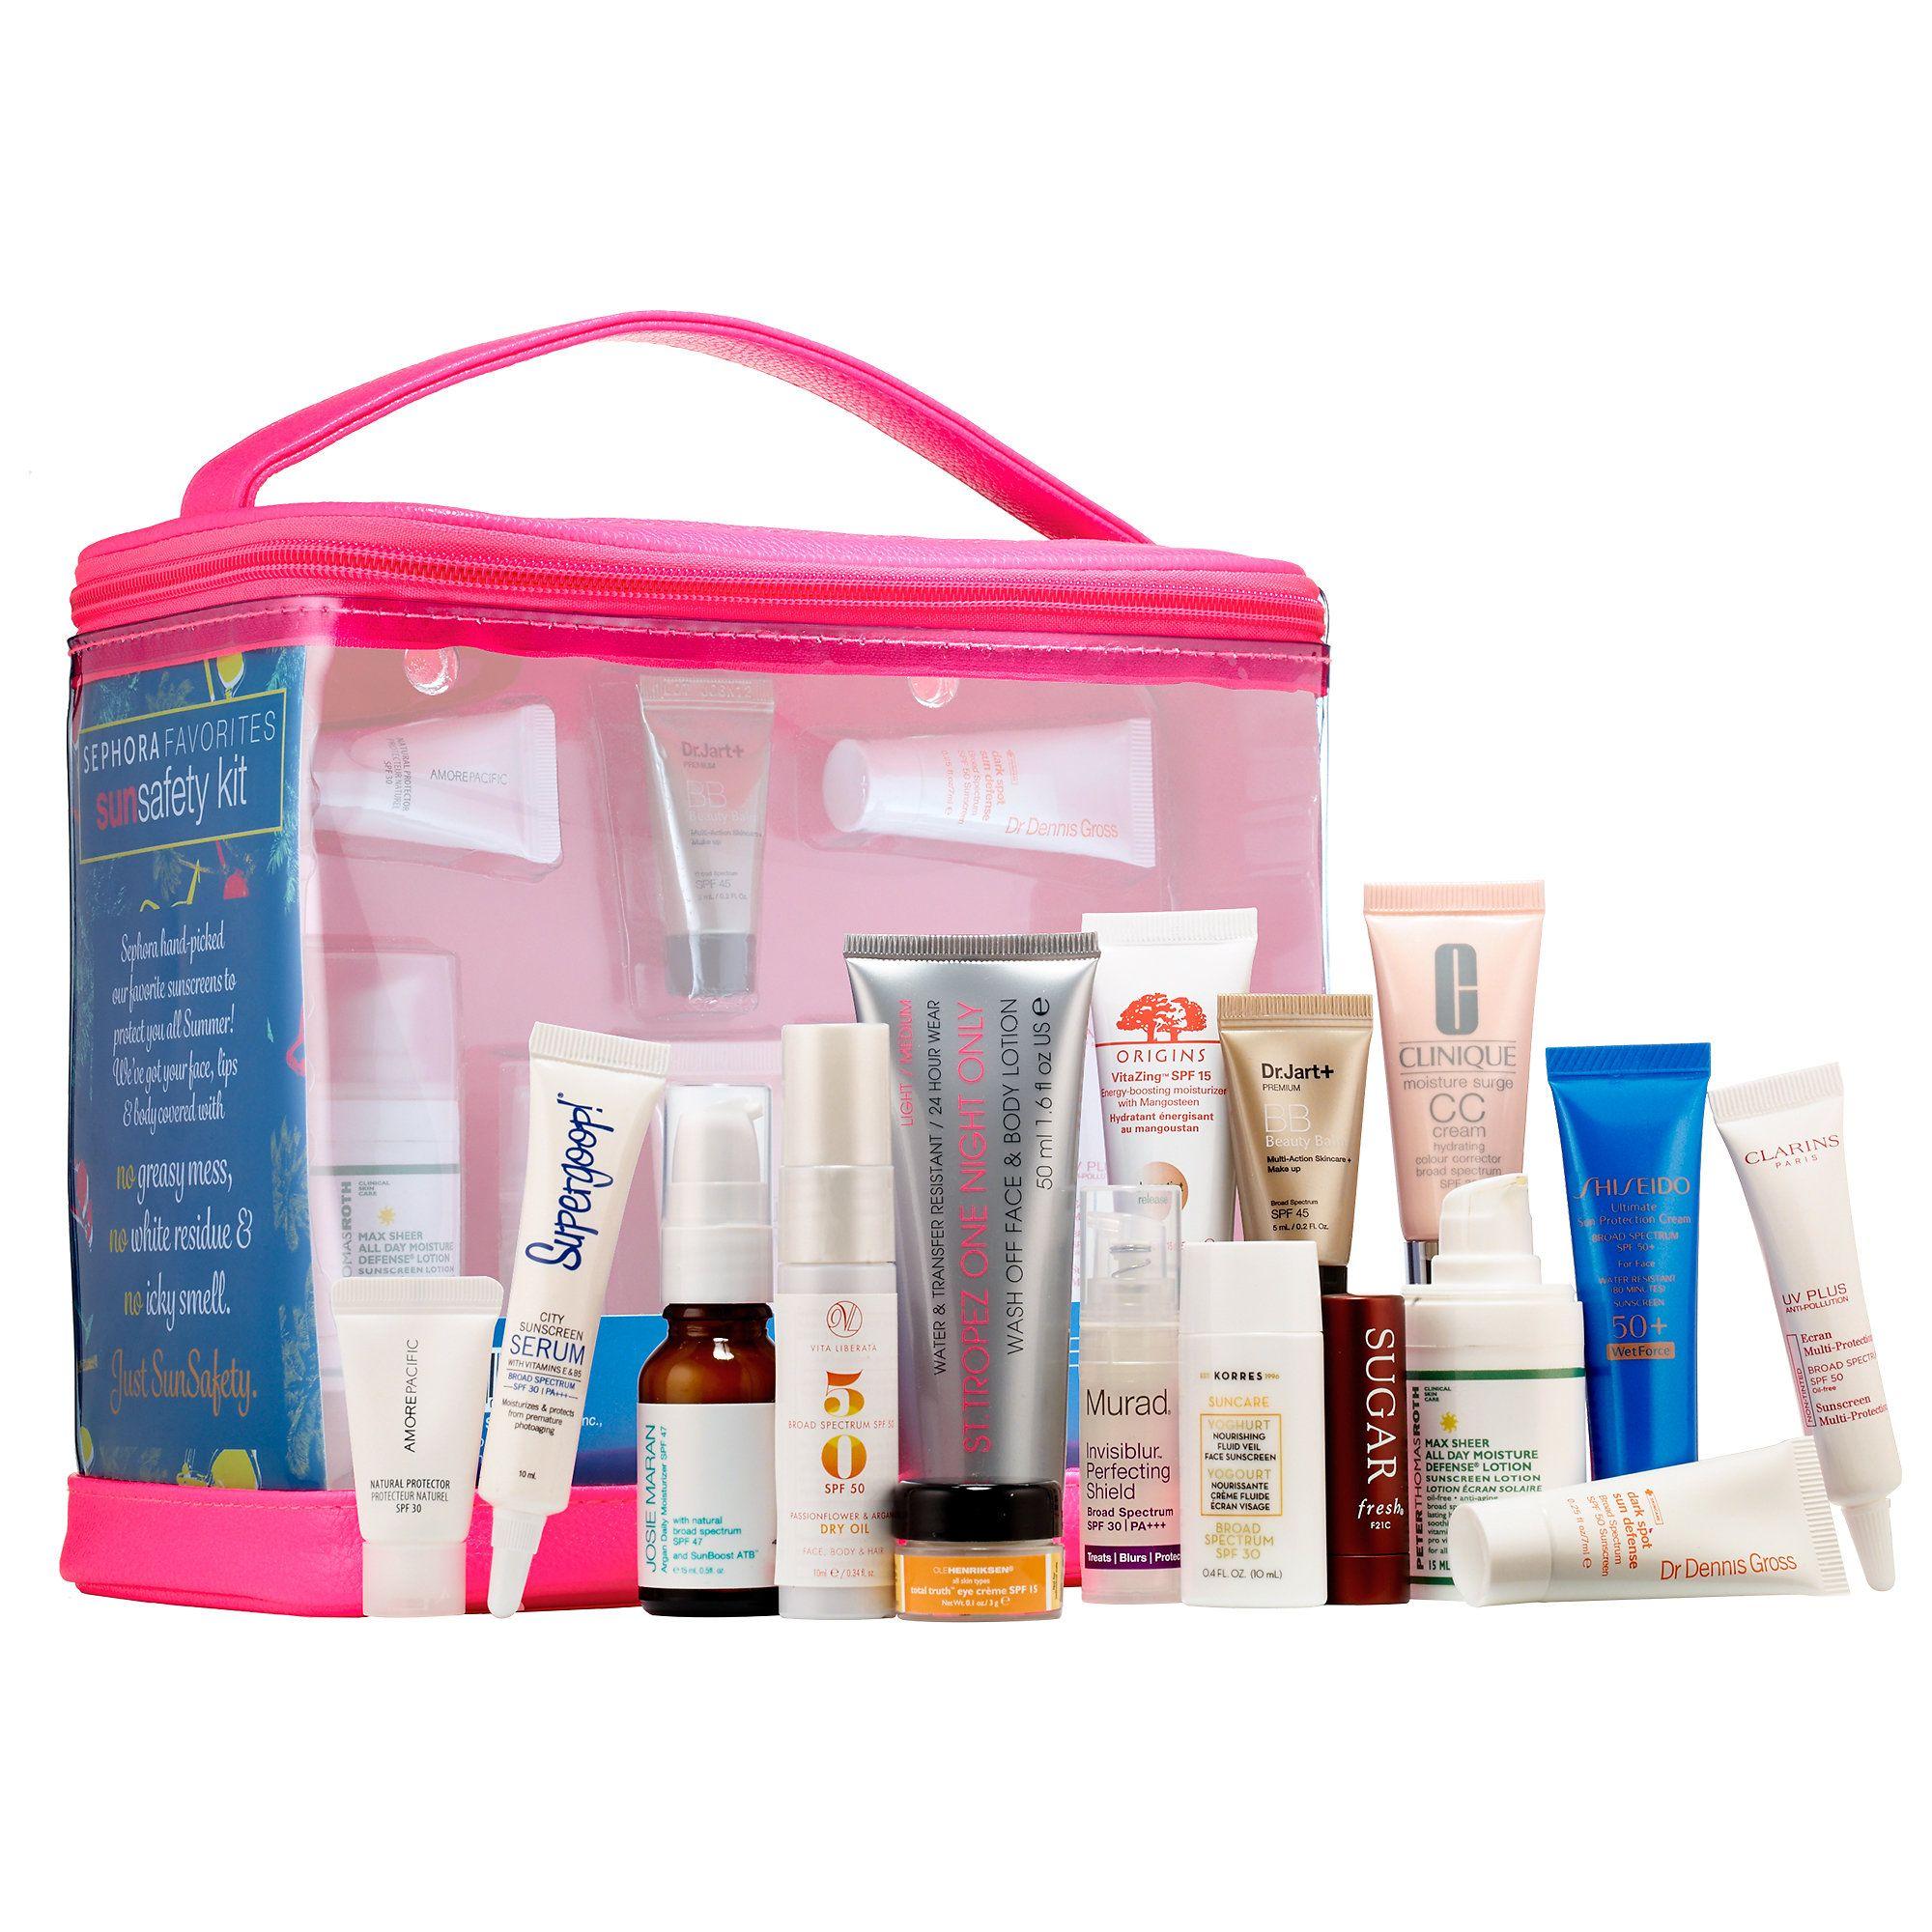 Sun Safety Kit Sephora Favorites Sephora Sephora